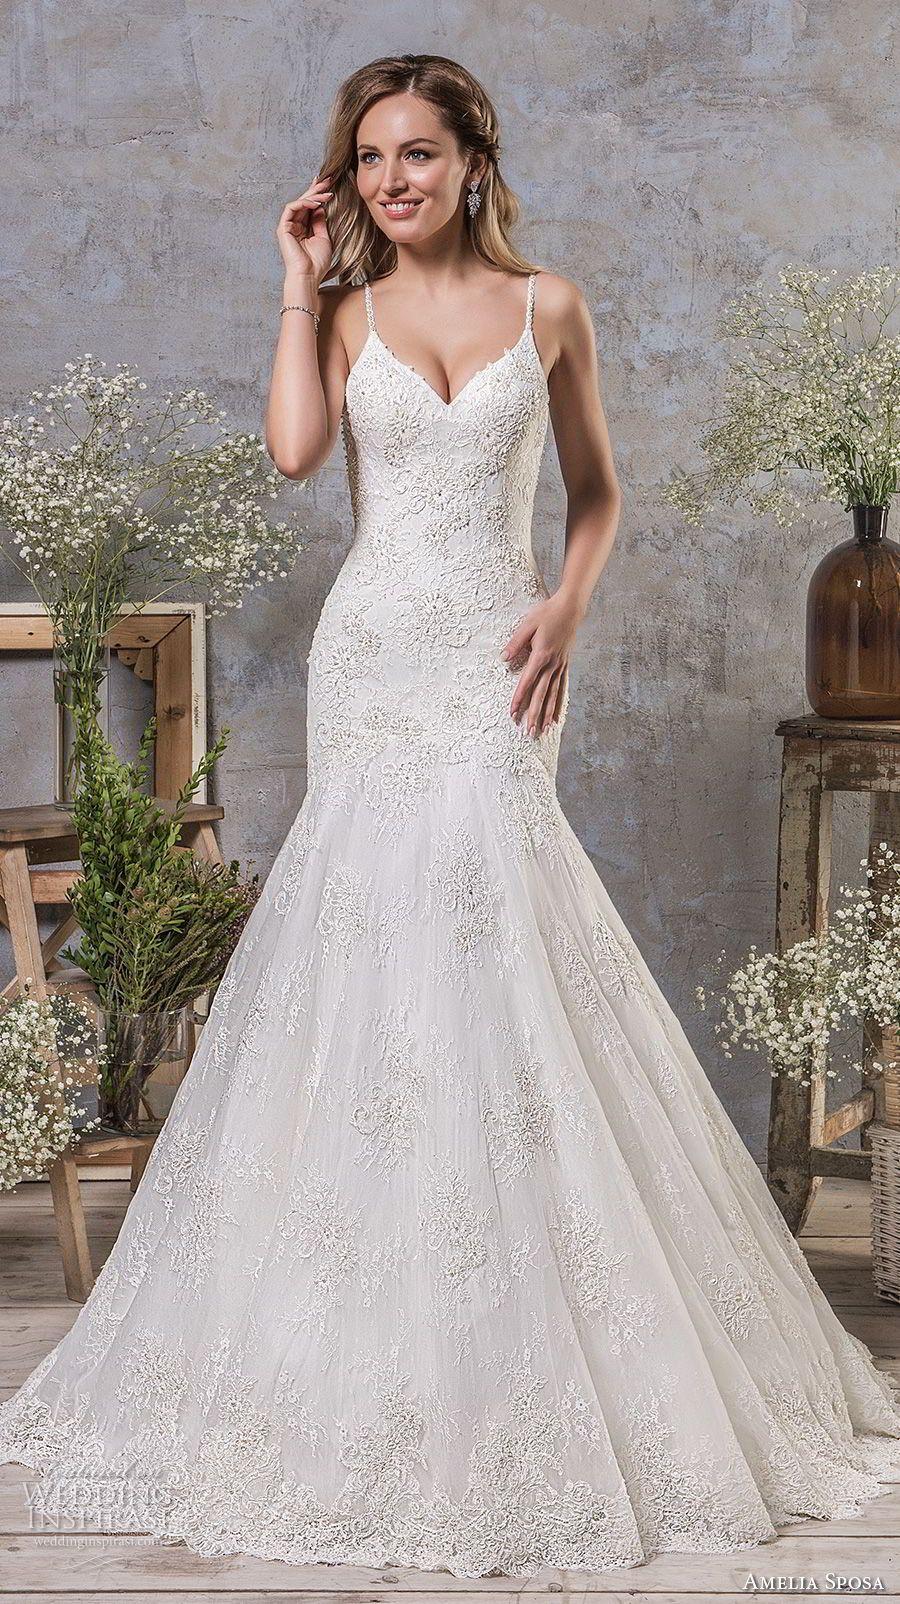 Amelia Sposa Fall 2018 Wedding Dresses Wedding Inspirasi Amelia Sposa Wedding Dress Drop Waist Wedding Dress Wedding Dresses